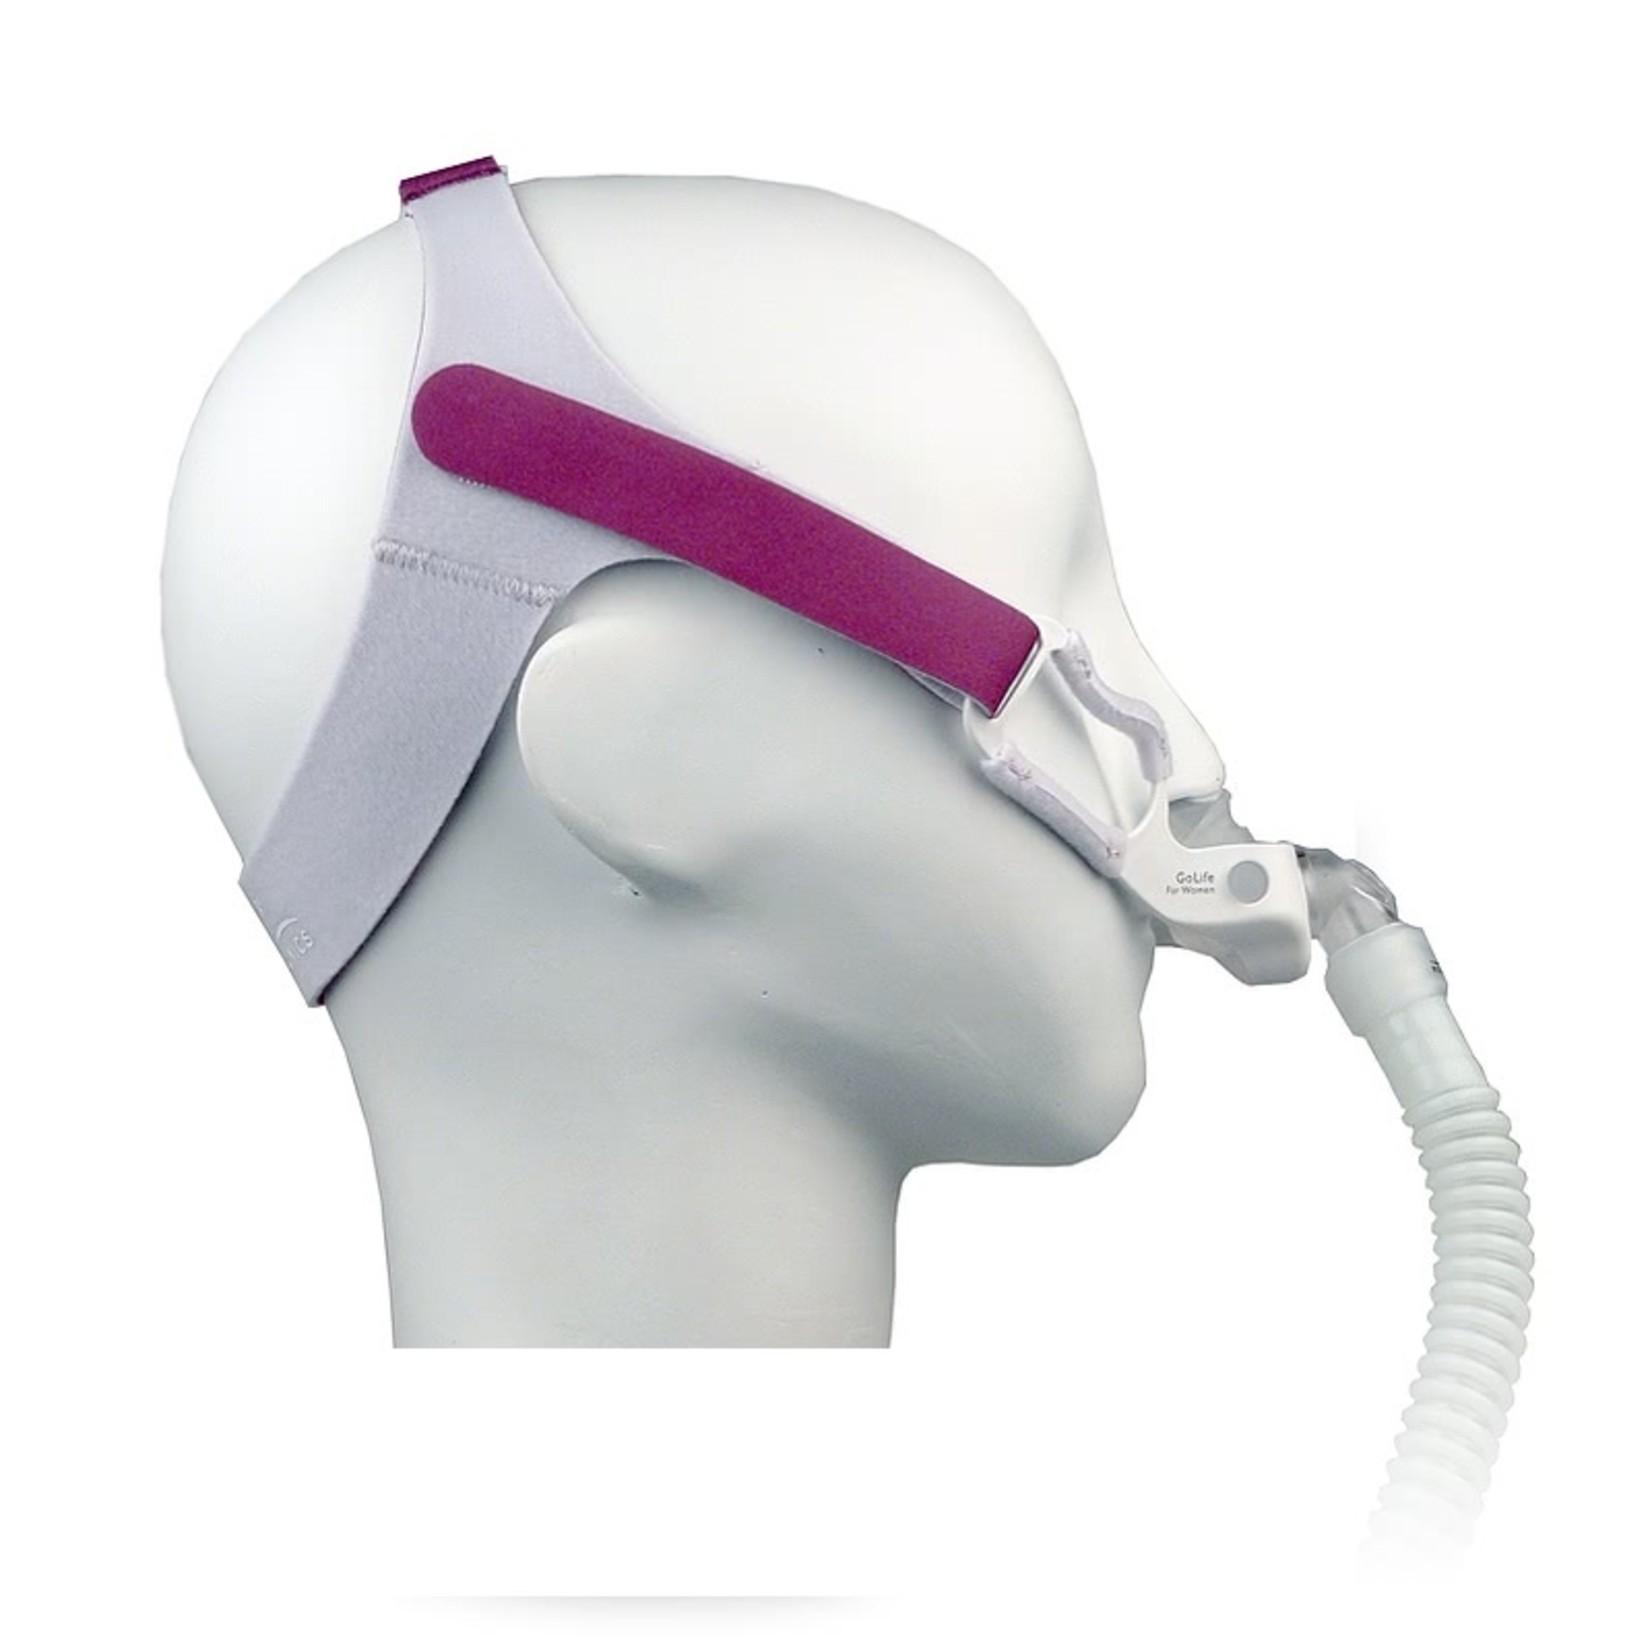 RESPIRONICS GoLife for Women Nasal Pillow  CPAP Interface